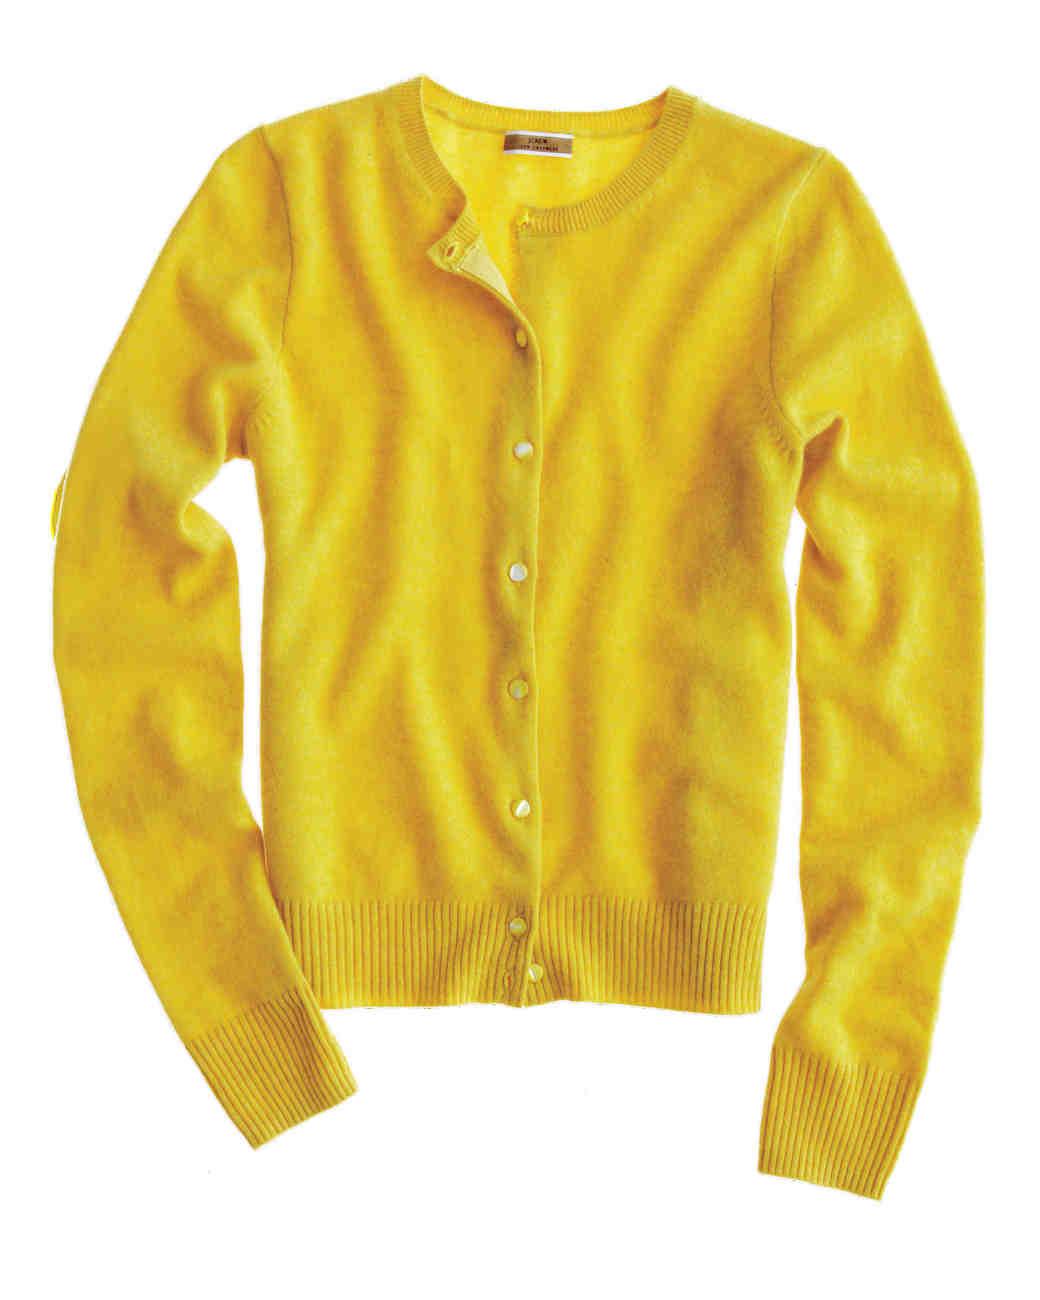 travel-accessories-yellow-cardigan-mwd107604.jpg